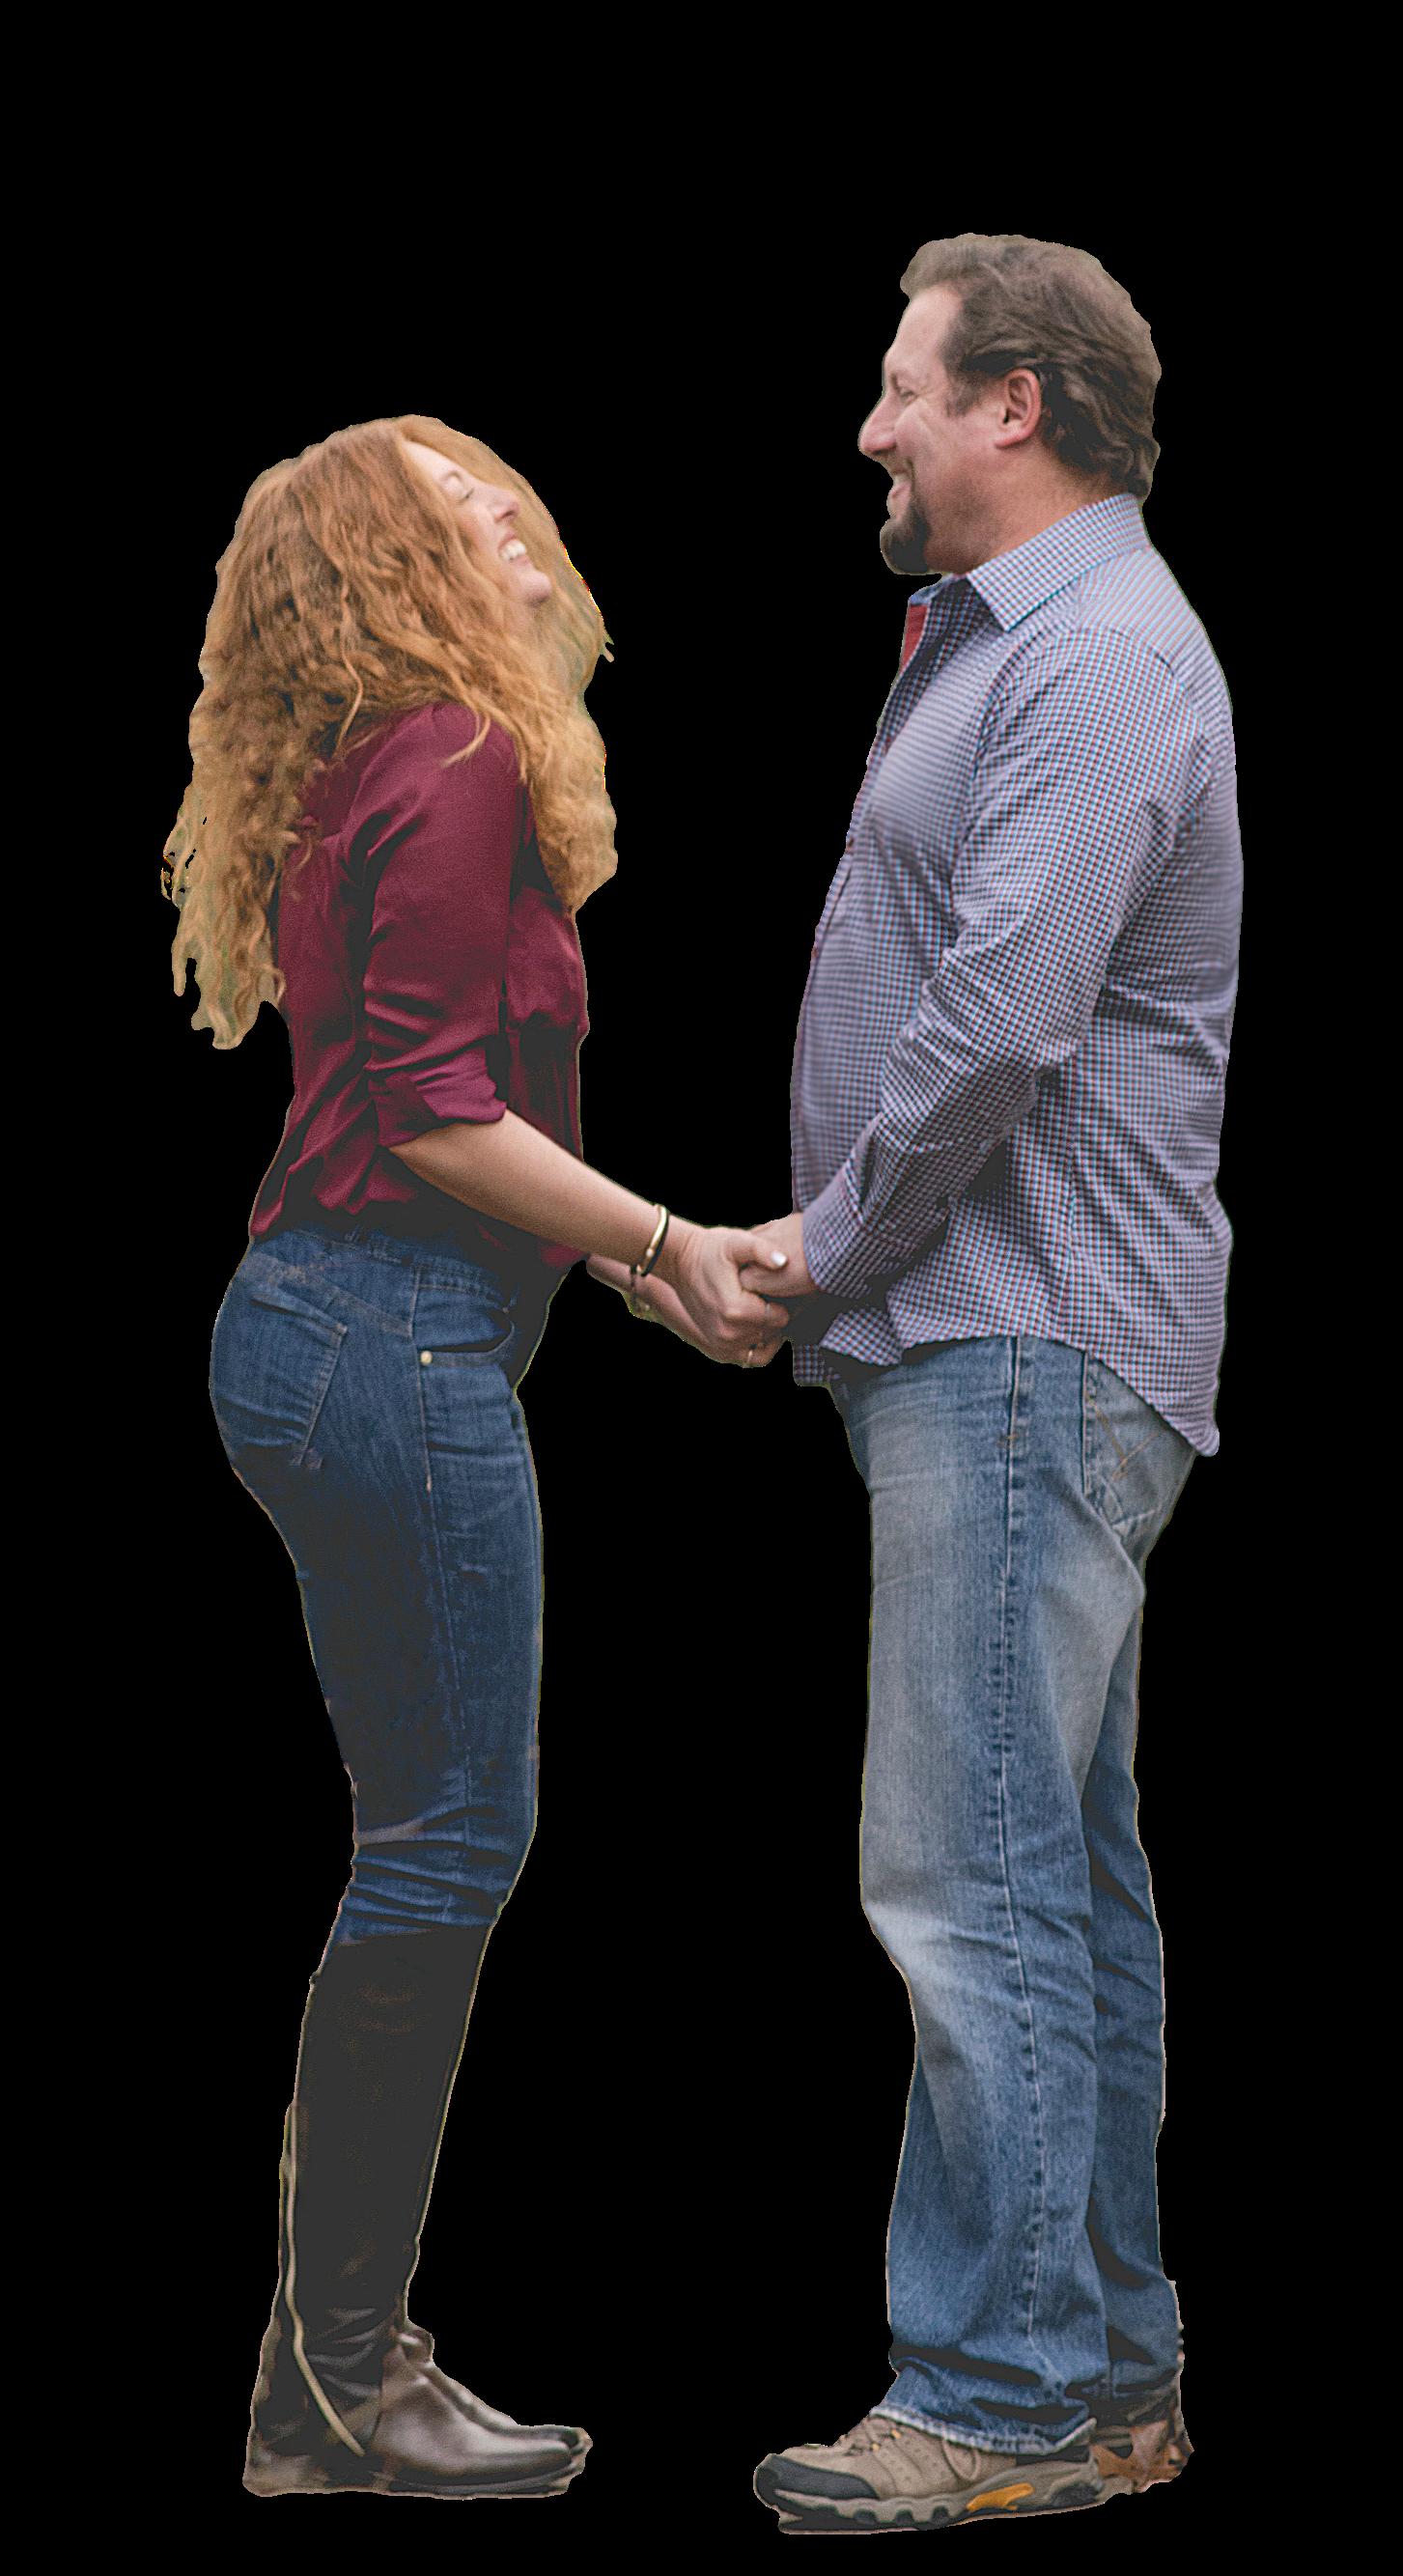 Kendra Seoane Chris DeCicco Evolve Dating Gurus best matchmaker denver